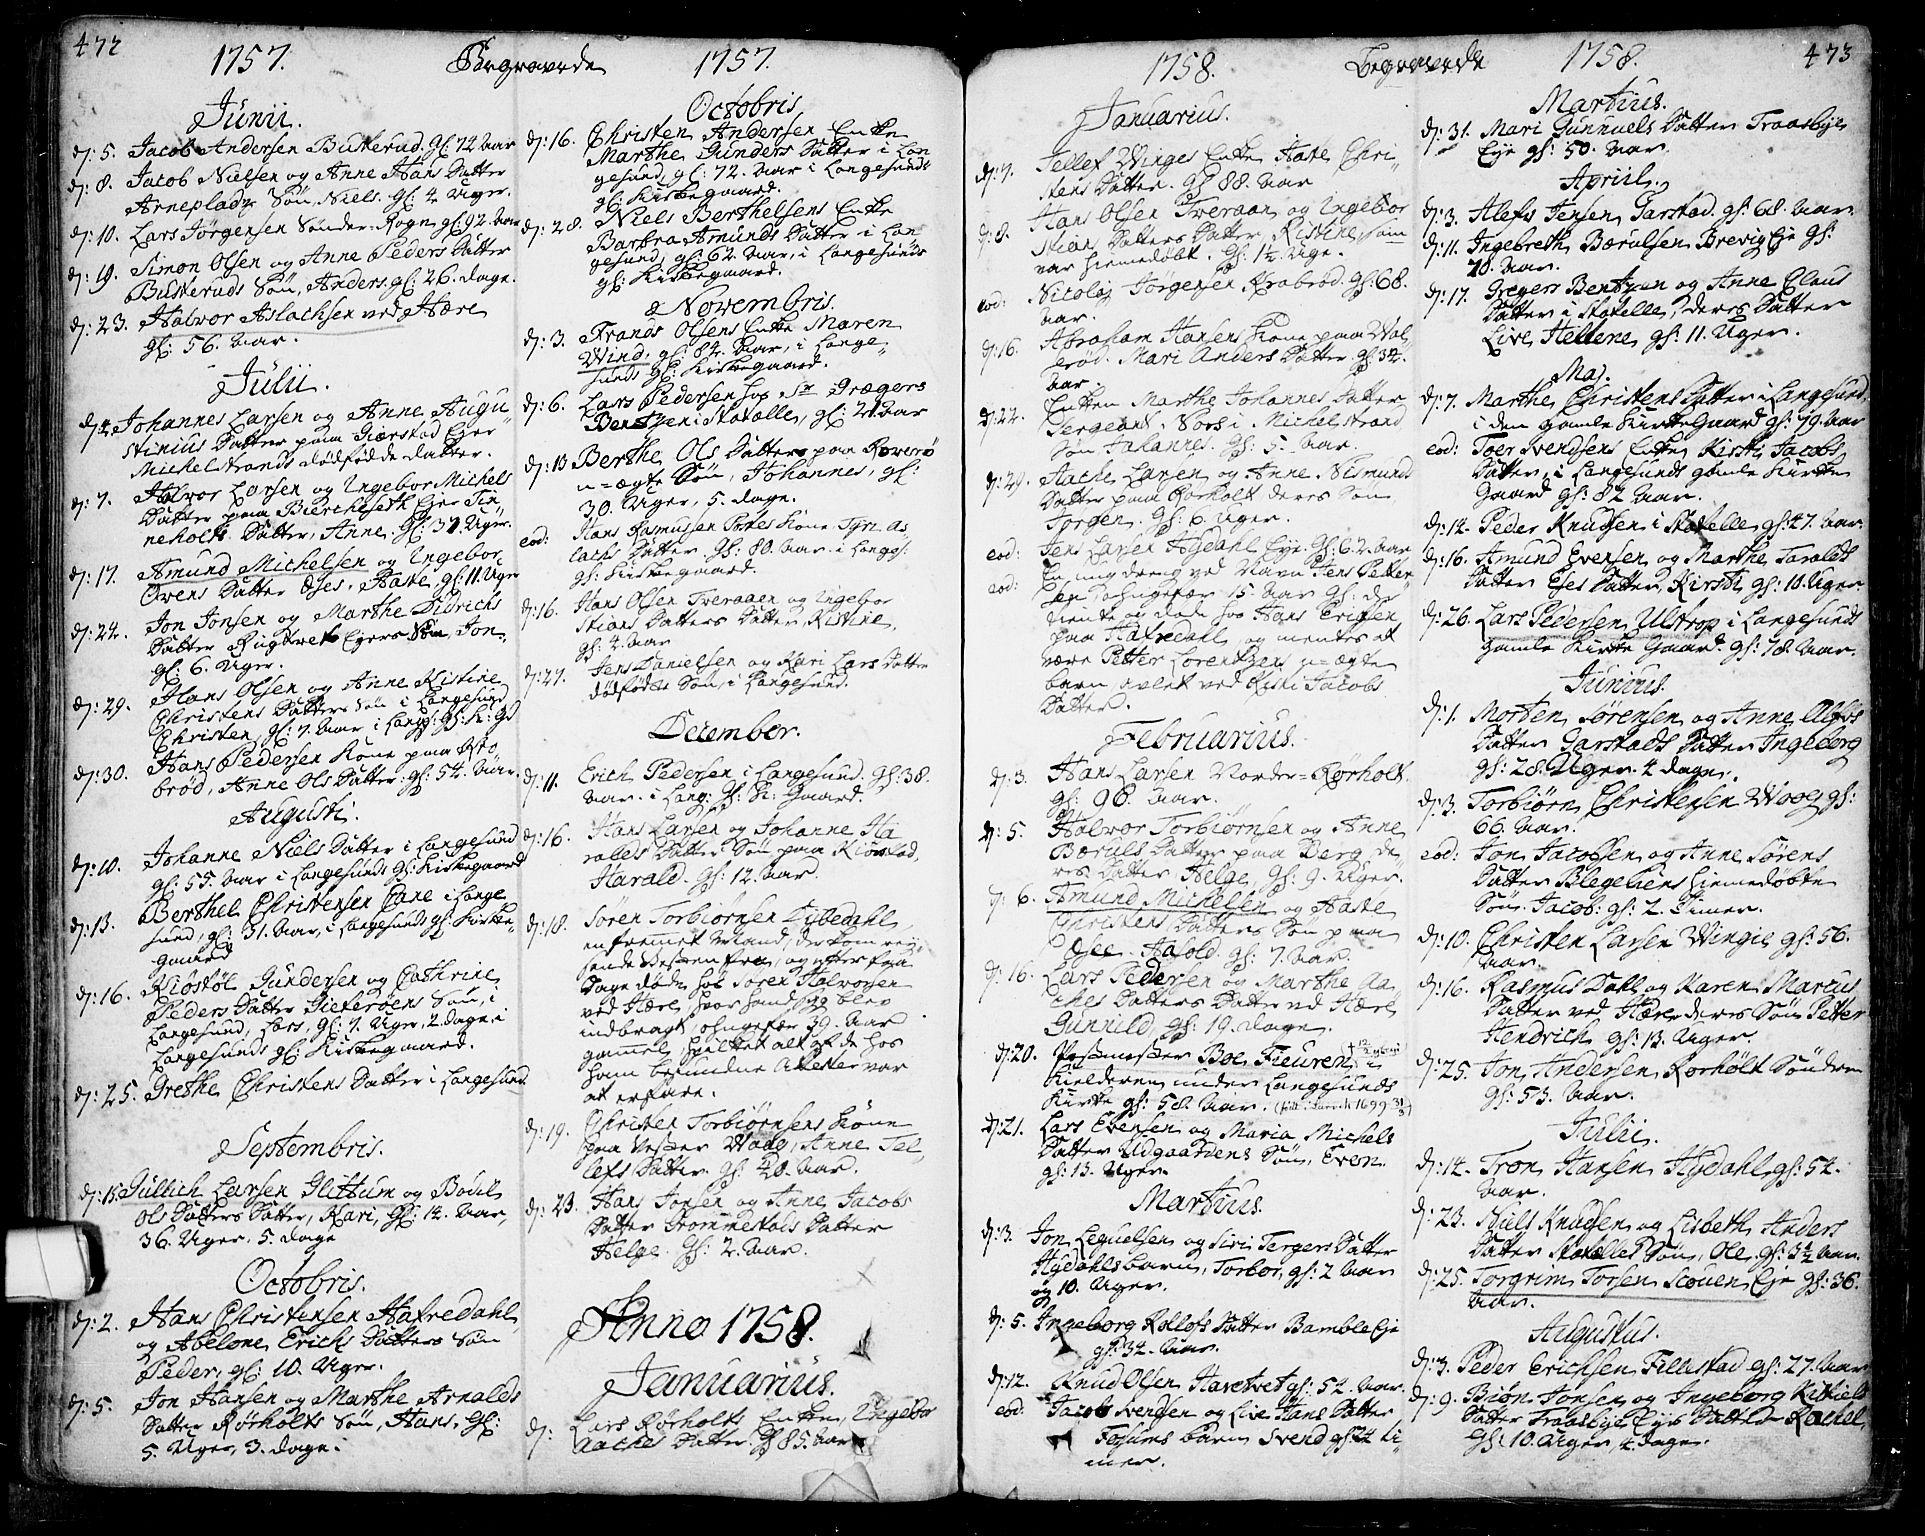 SAKO, Bamble kirkebøker, F/Fa/L0001: Ministerialbok nr. I 1, 1702-1774, s. 472-473